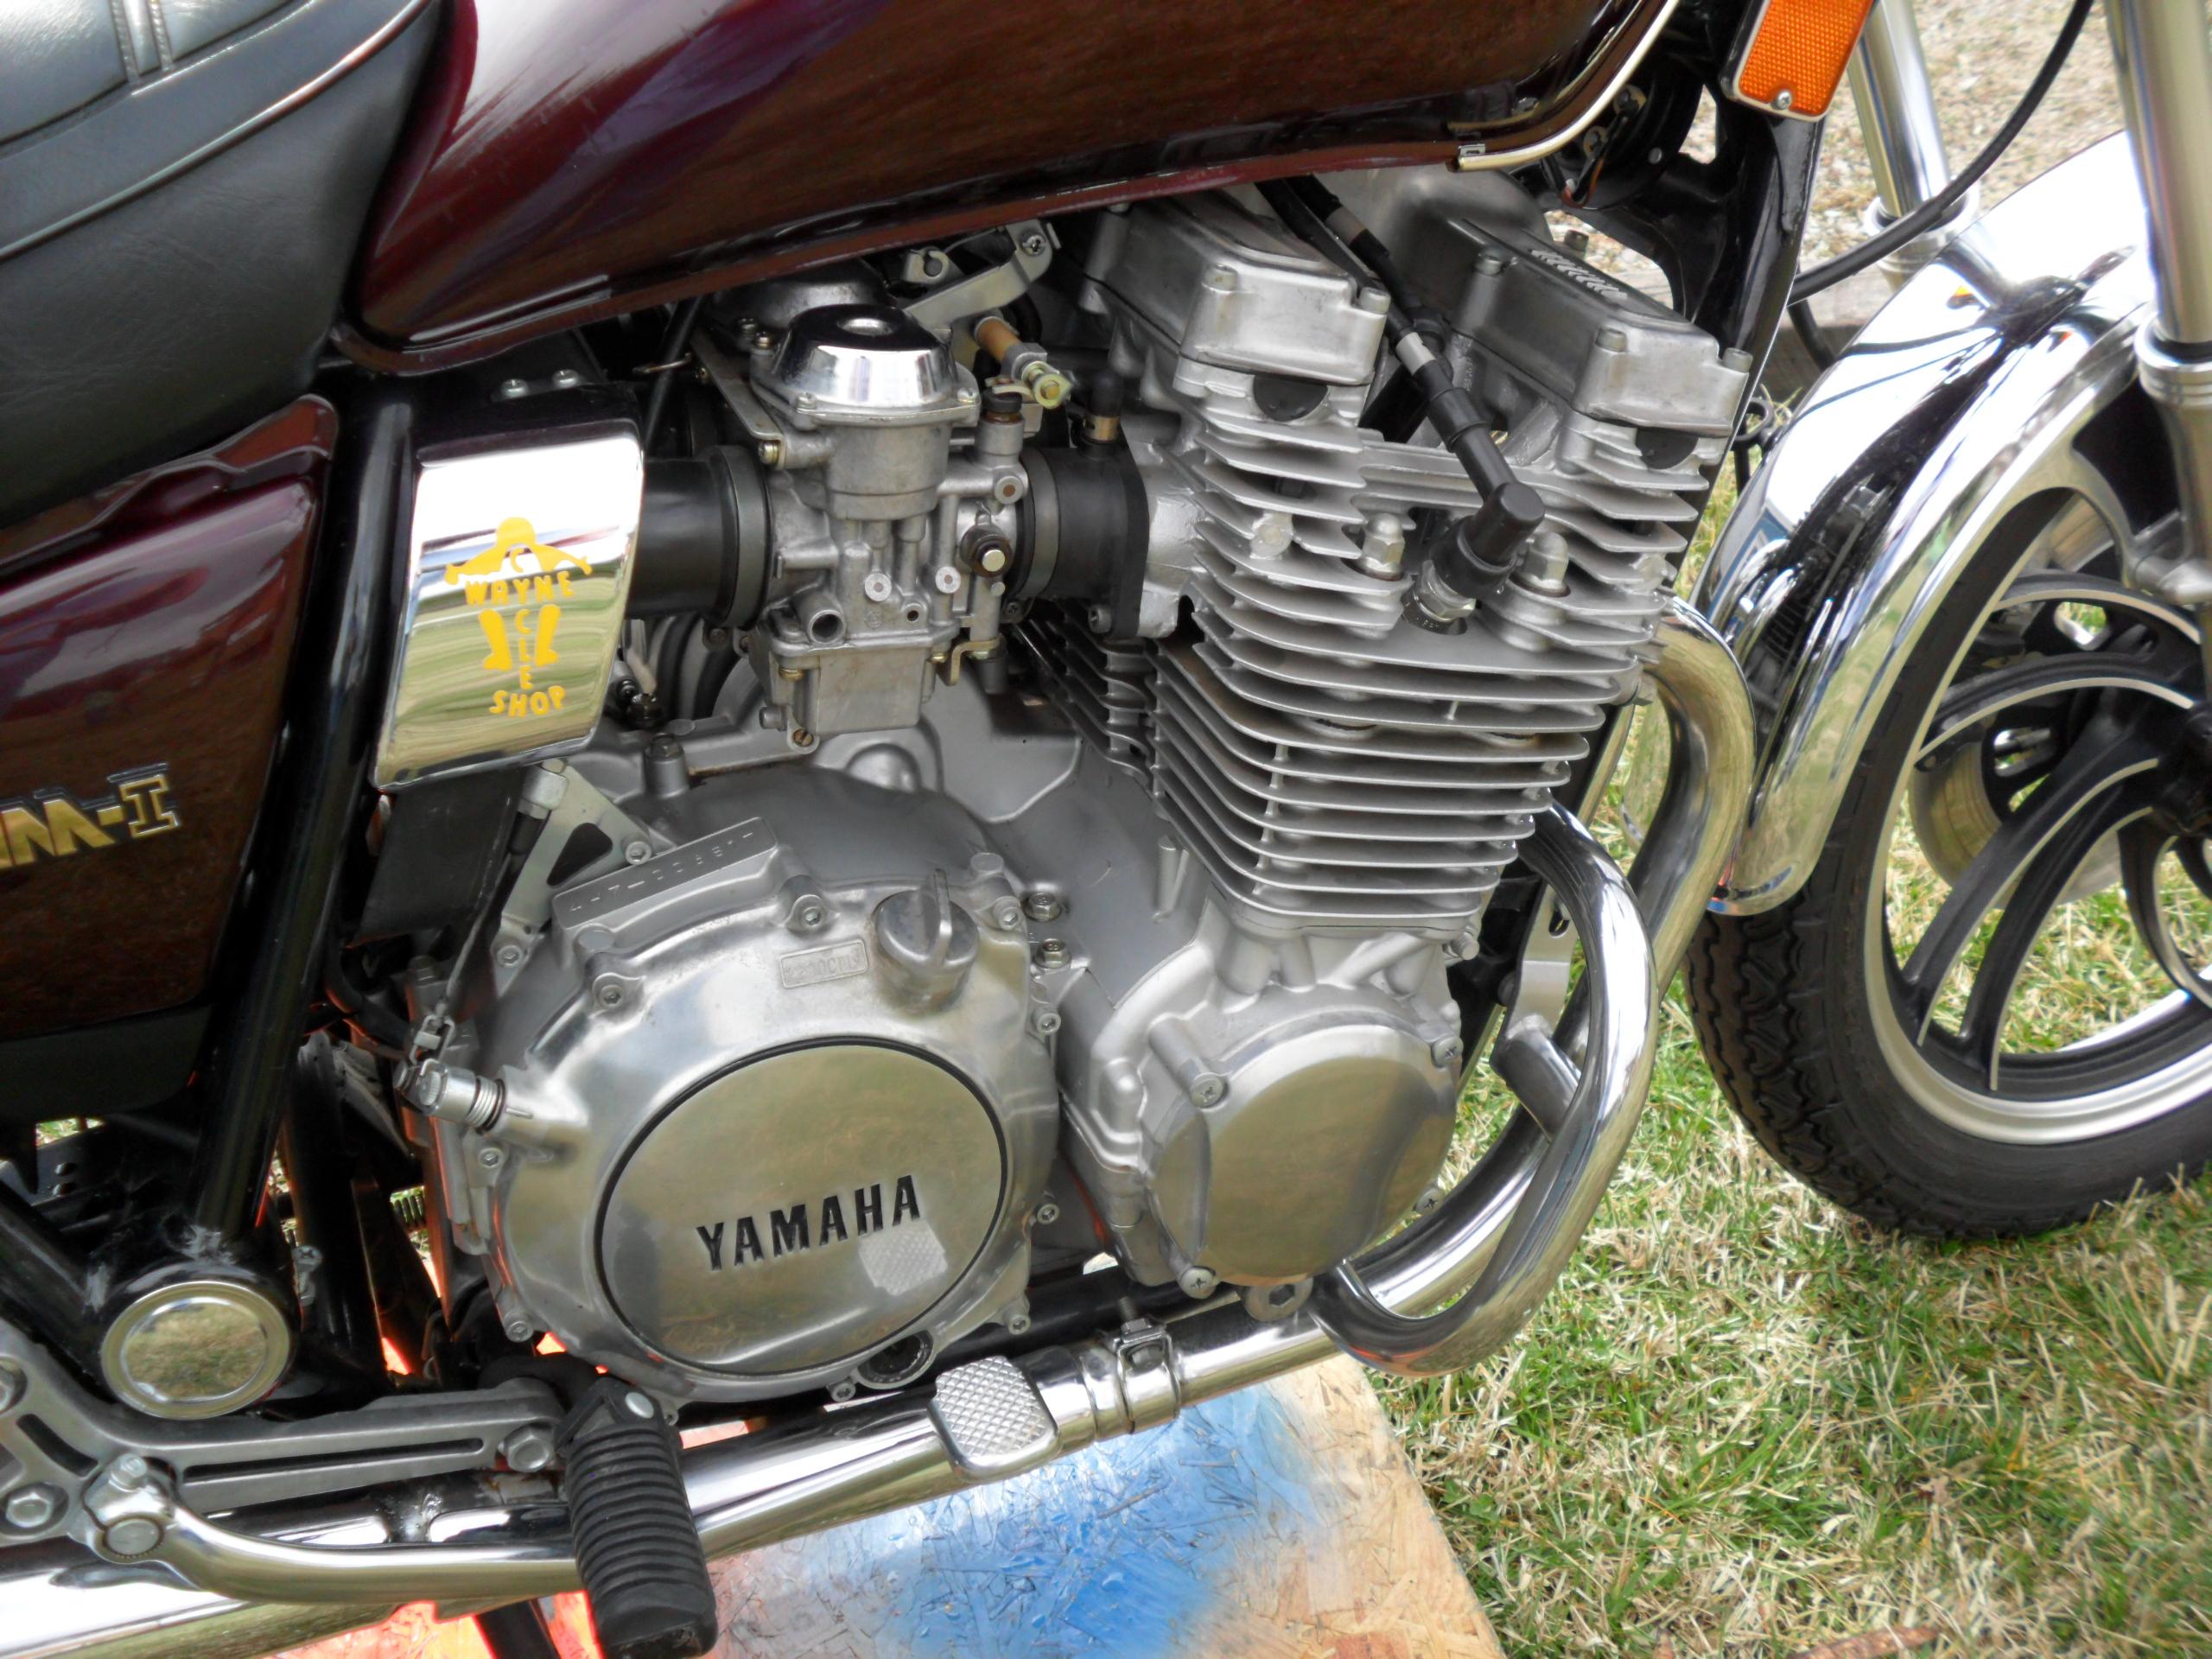 Yamaha Xj 650 Maxim Wiring Diagram - All Kind Of Wiring Diagrams •